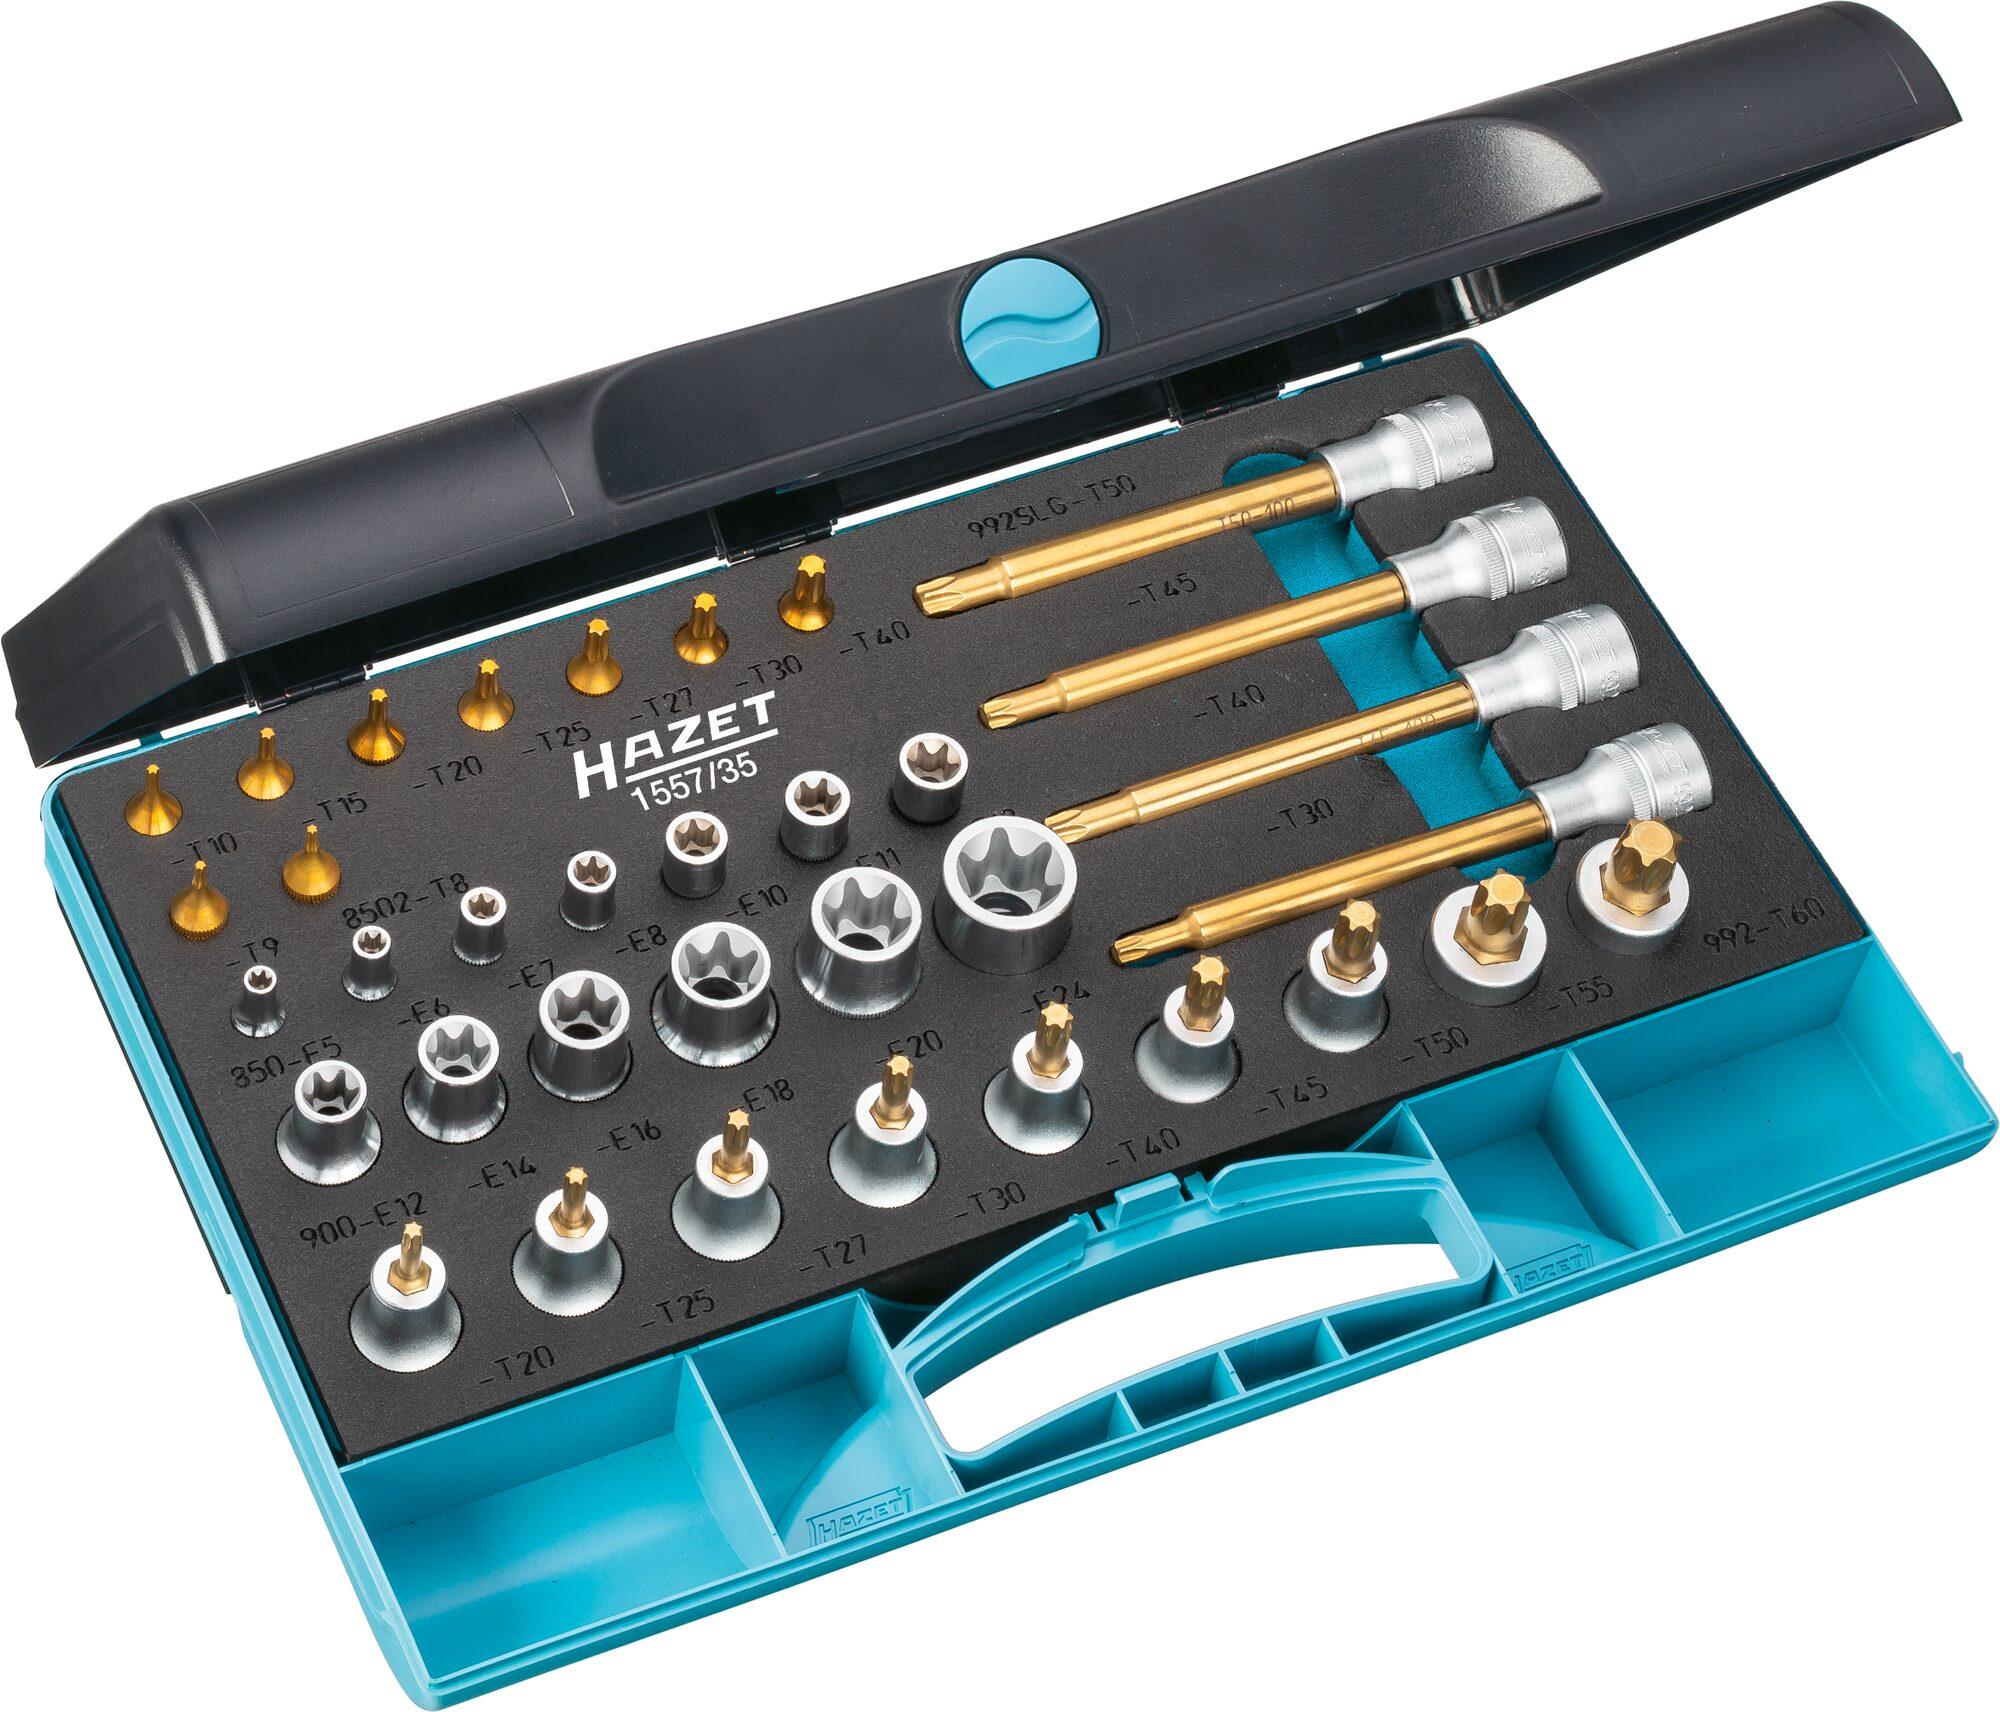 HAZET Werkzeug Satz TORX® 1557/35 ∙ Vierkant hohl 6,3 mm (1/4 Zoll), Vierkant hohl 12,5 mm (1/2 Zoll) ∙ E6–E24